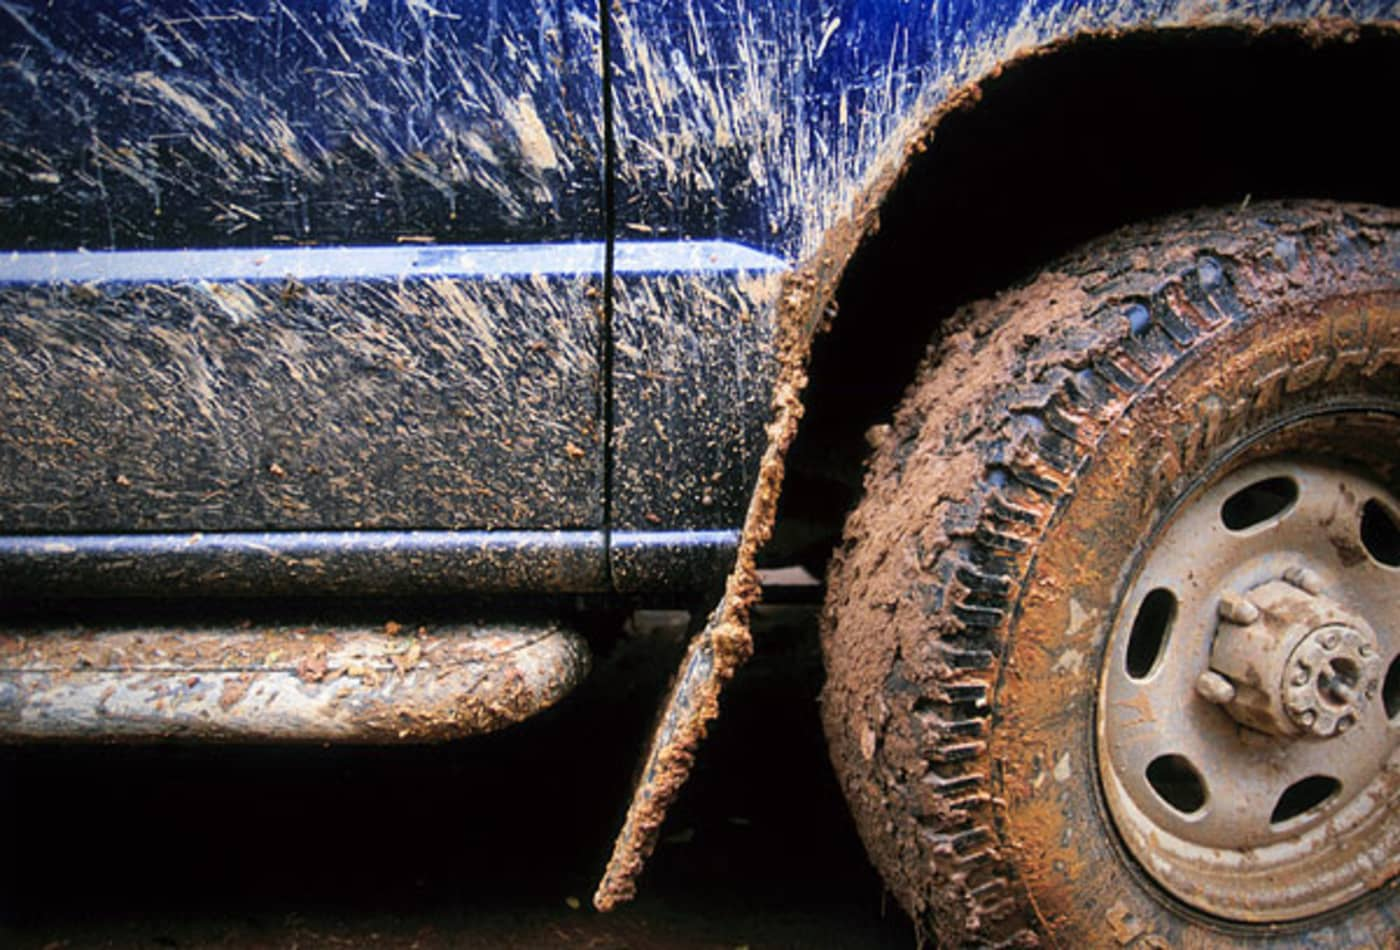 Americas-nanny-state-laws-muddy-car.jpg